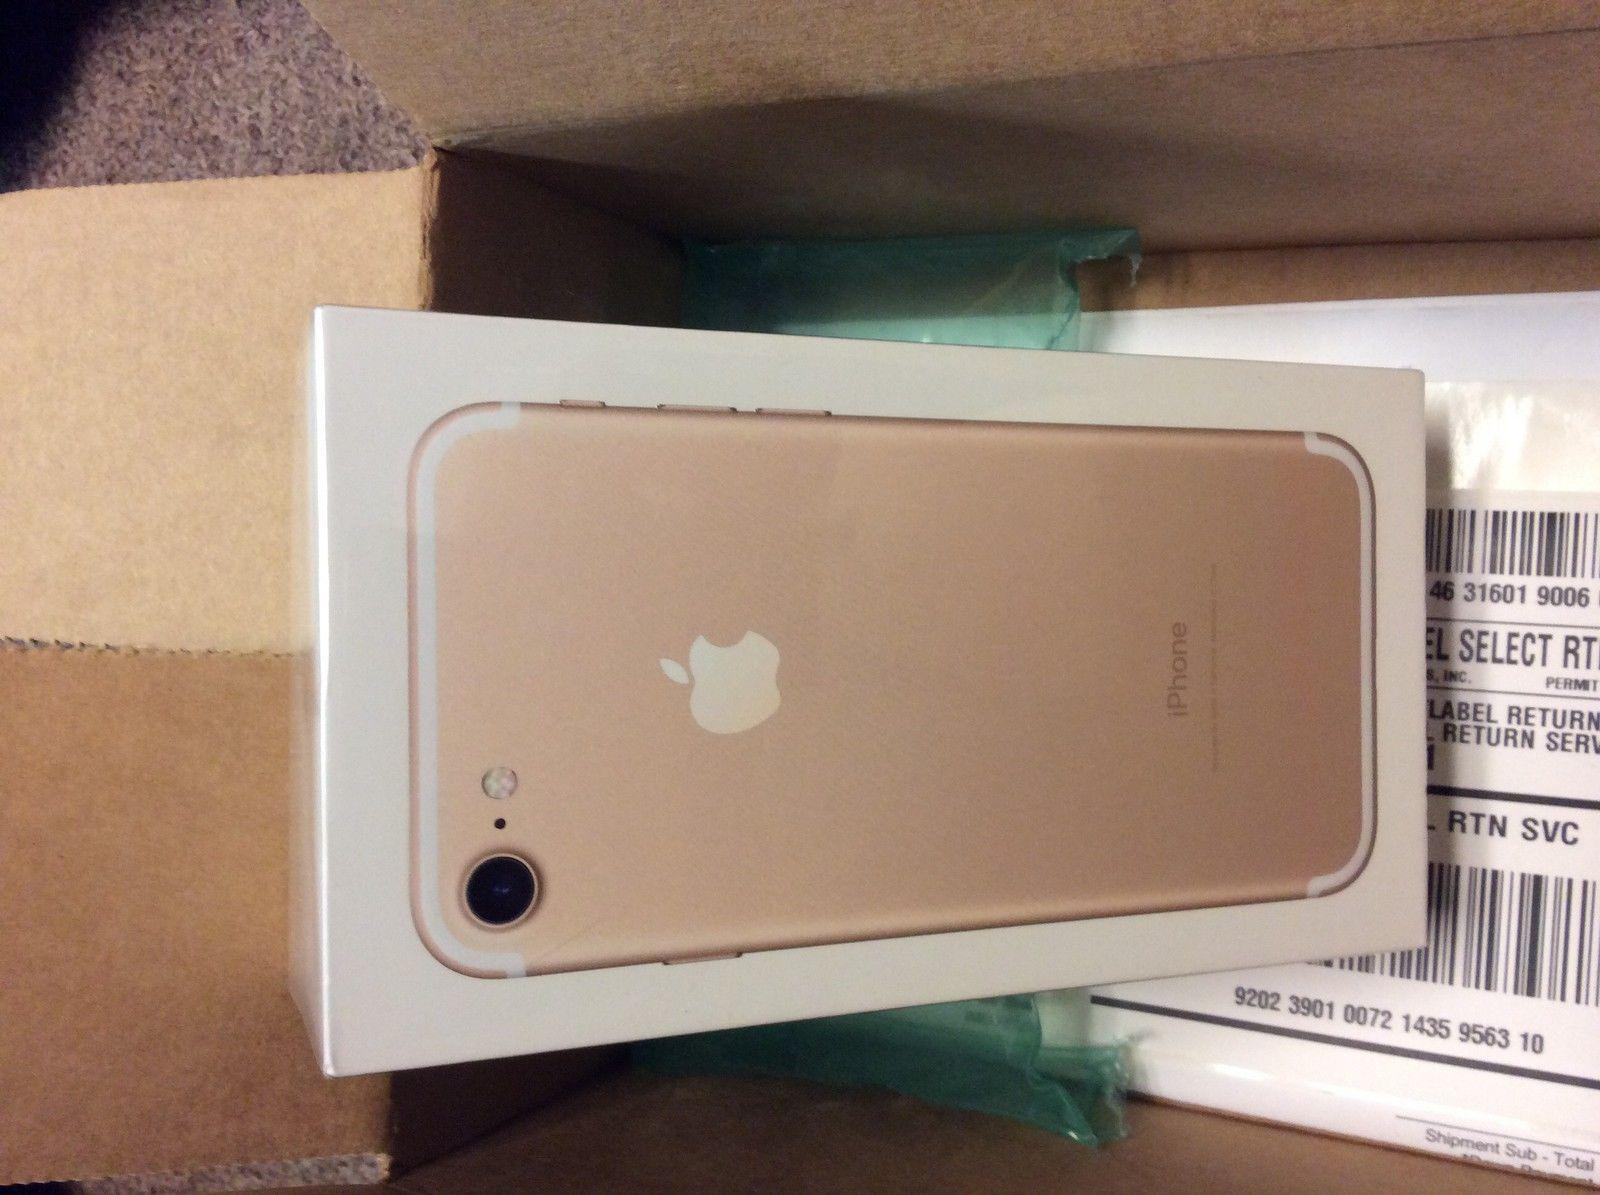 new apple iphone 7 32gb gold. Black Bedroom Furniture Sets. Home Design Ideas